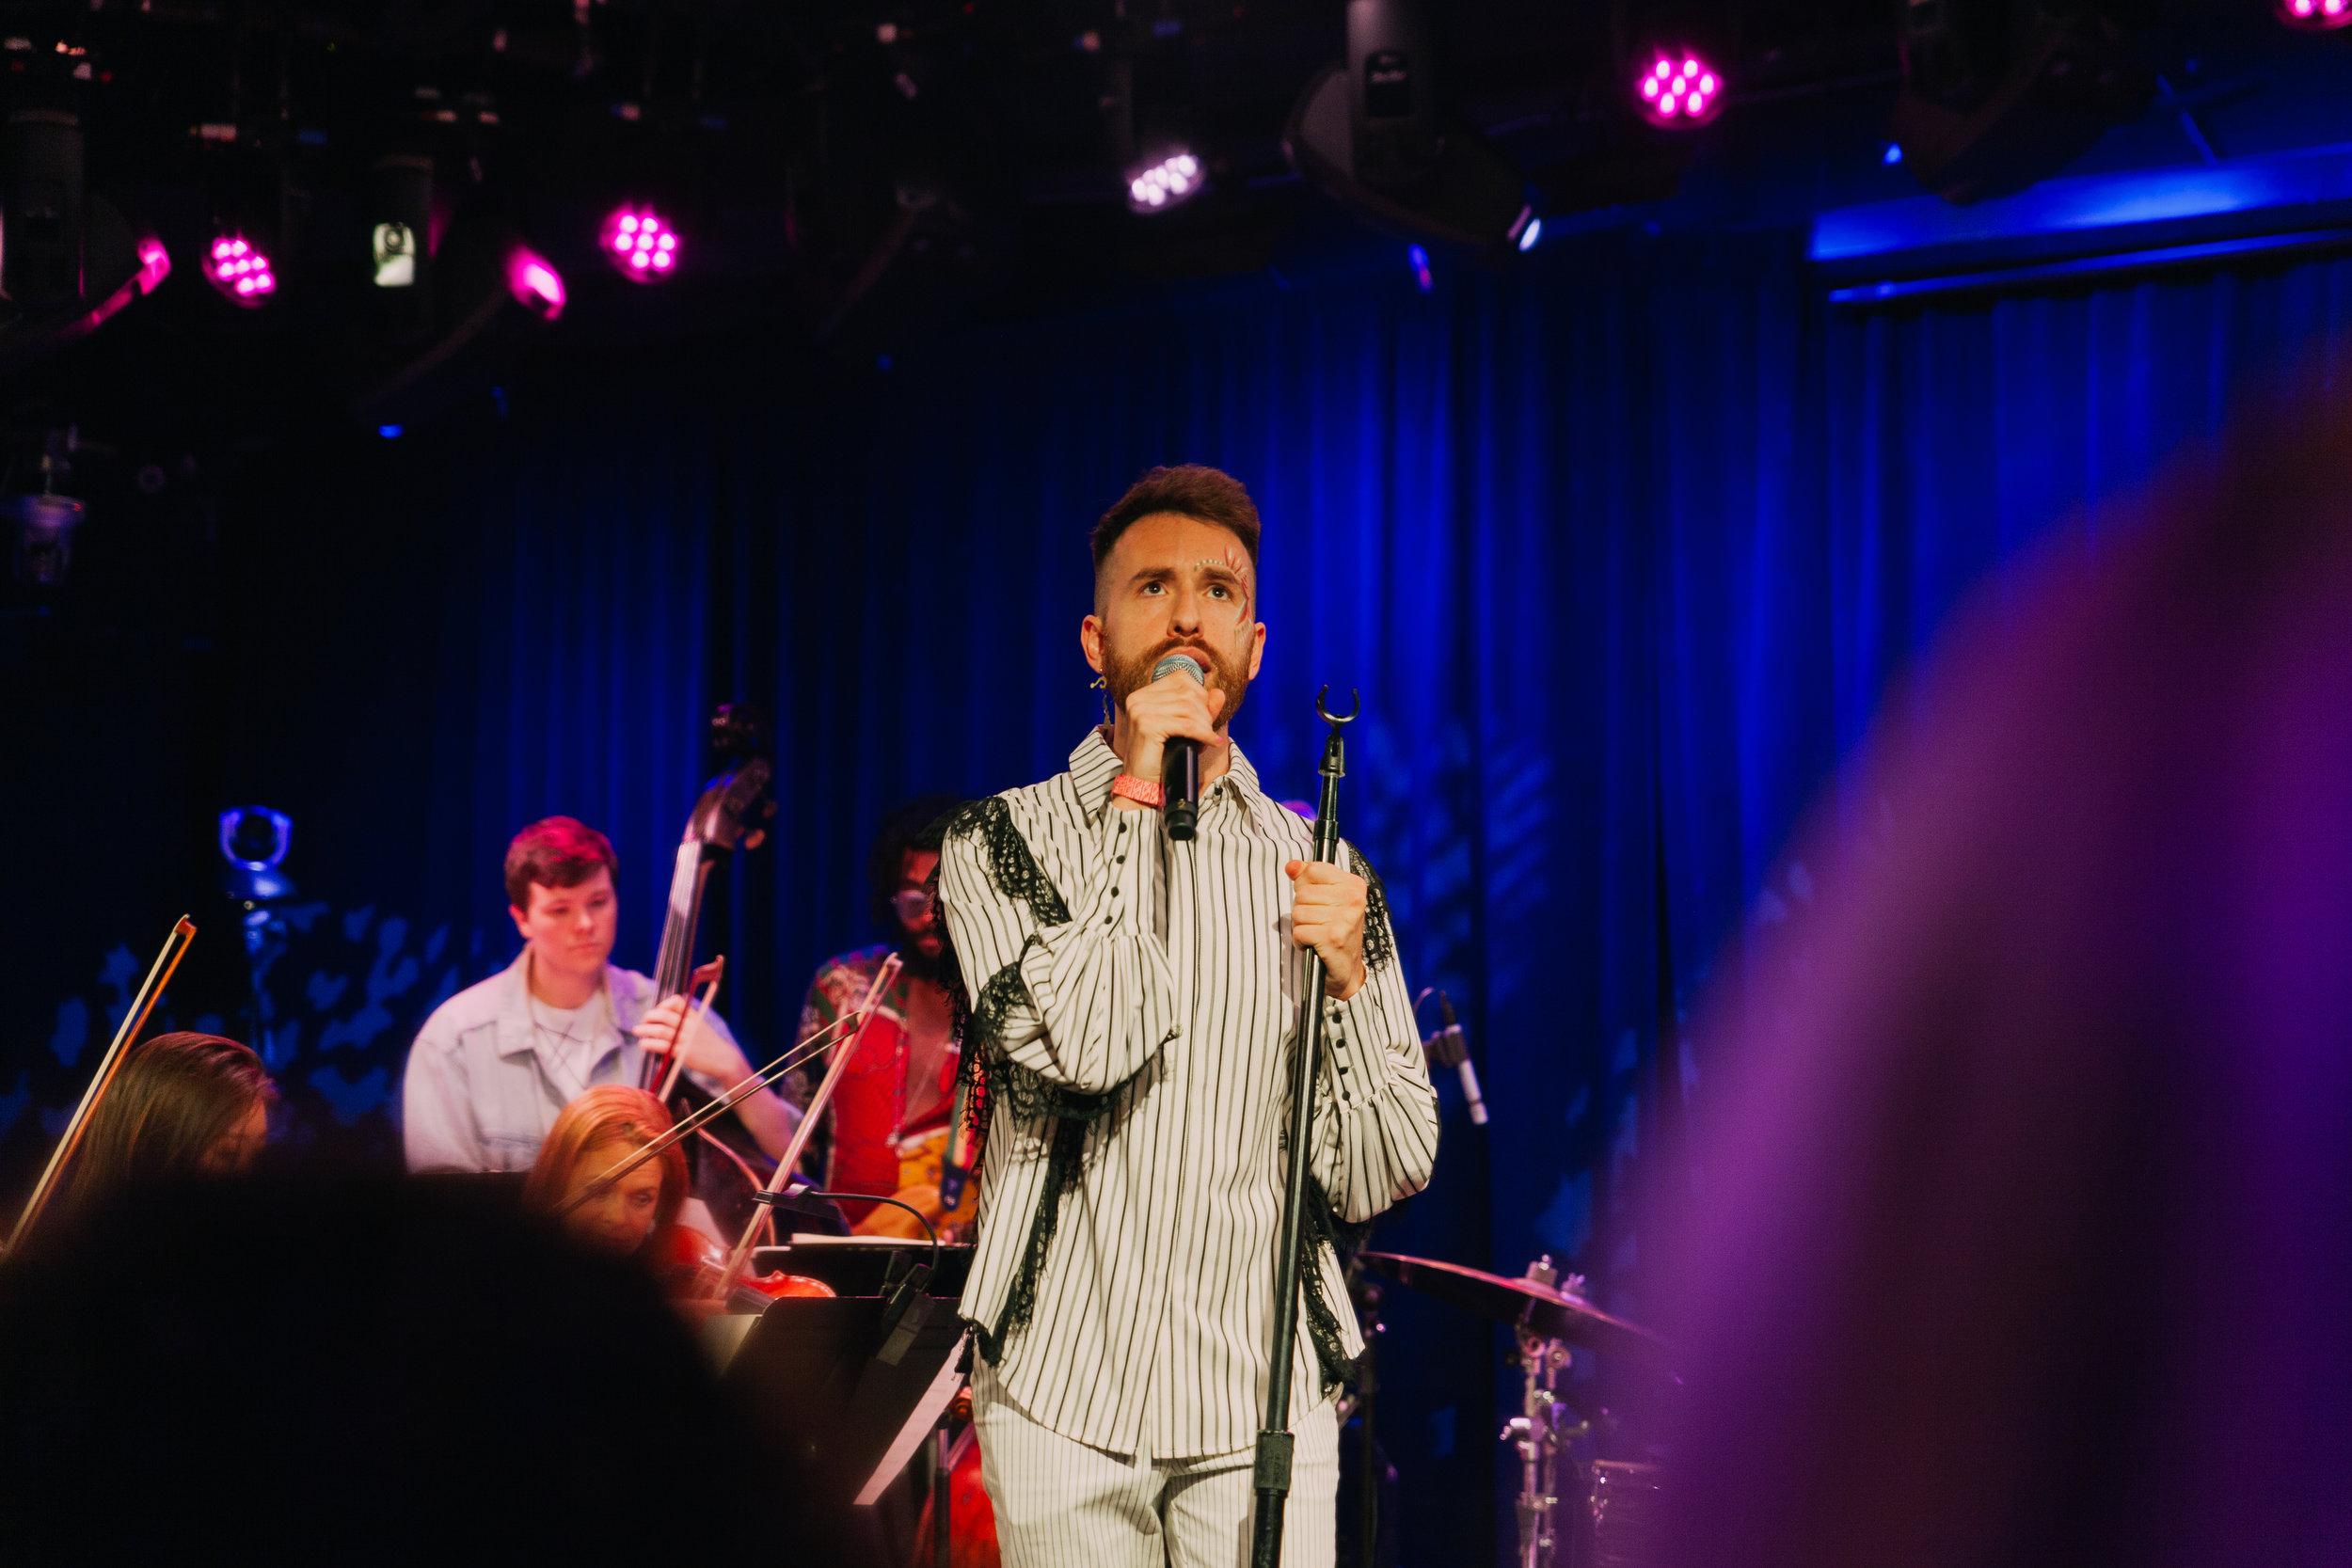 Vocalist & Stonewall Ambassador Michael Blume